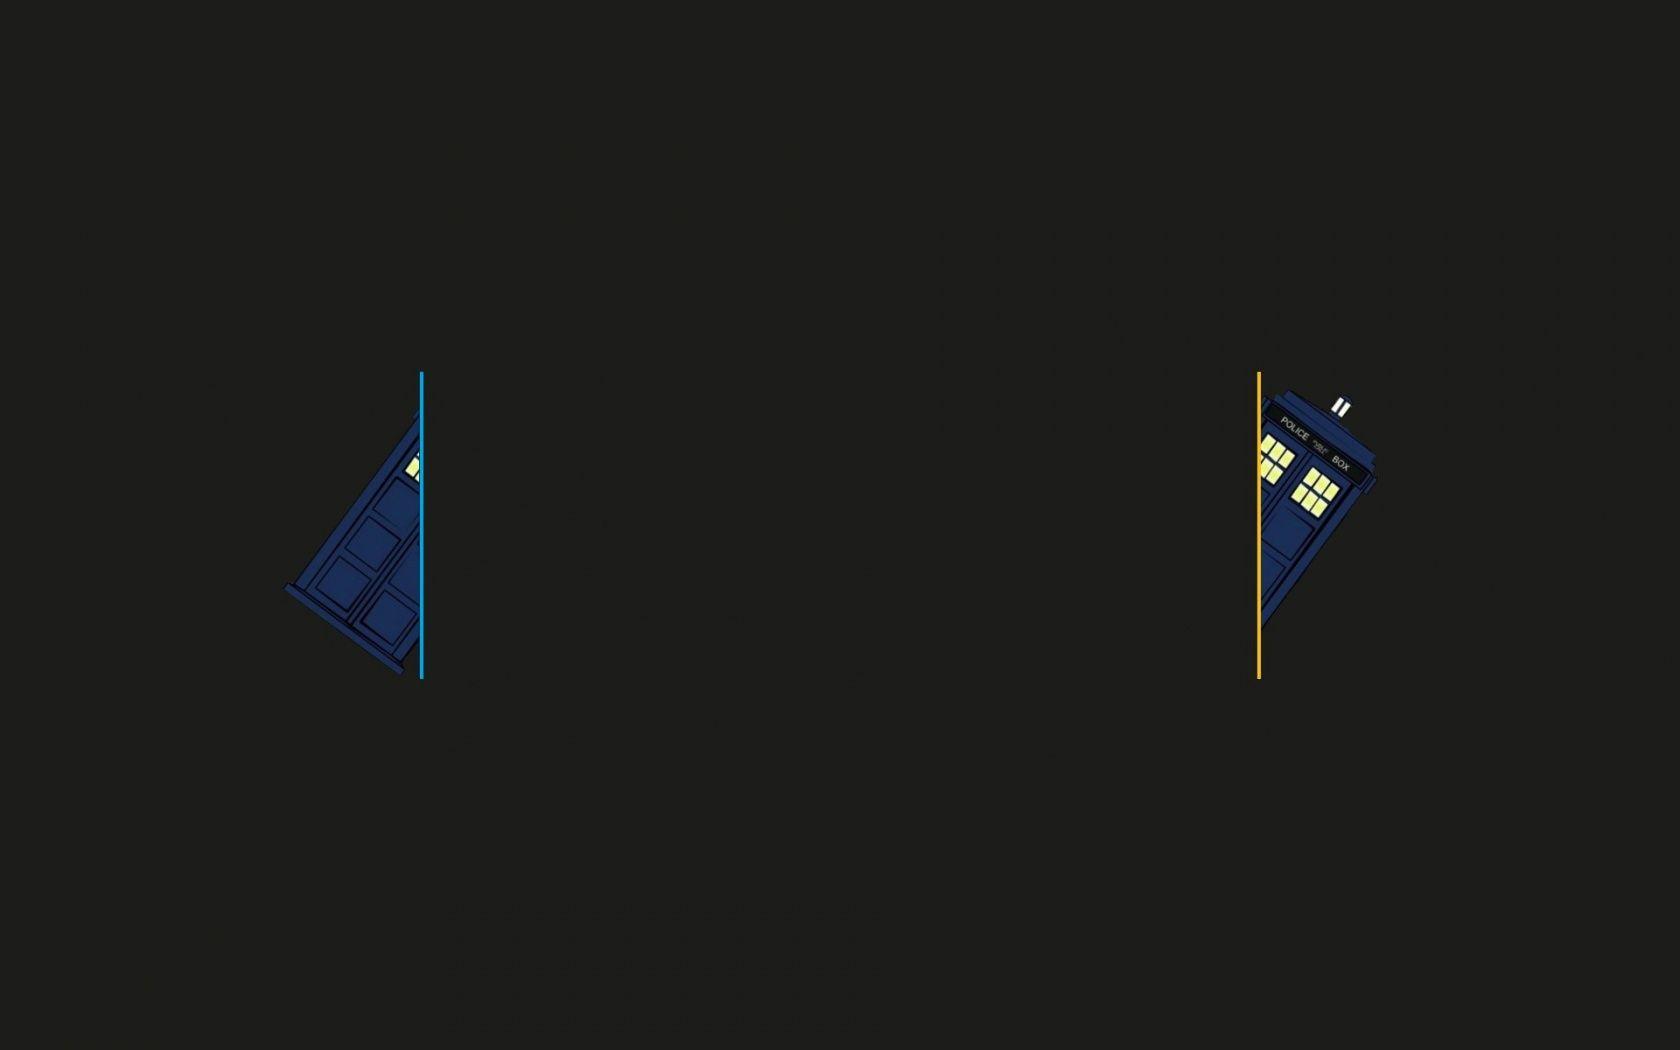 Cool Wallpaper Mac Doctor Who - 2e864bfd969036448c0d83d89a7d6eca  You Should Have_784129.jpg